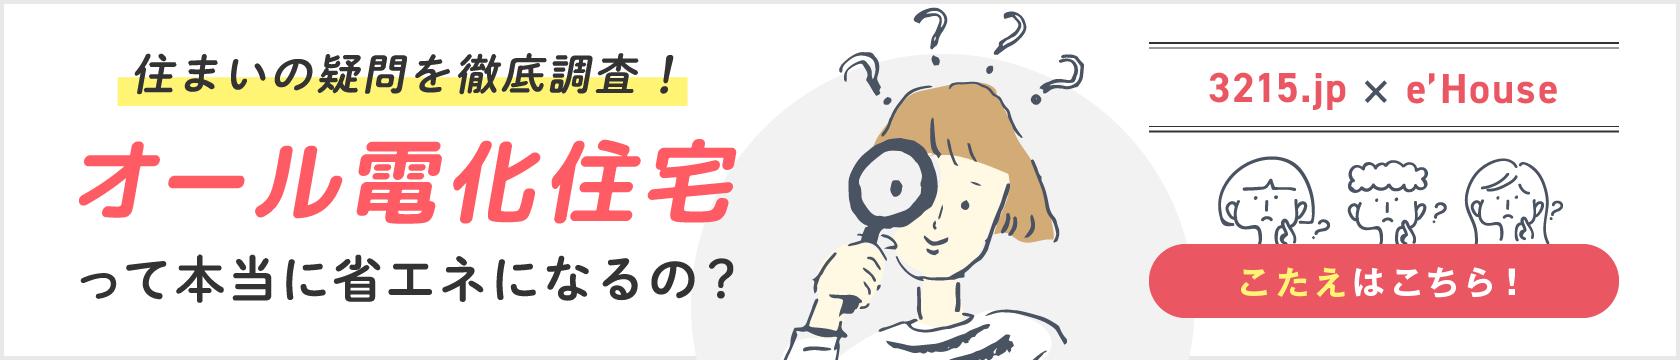 3215.jp × e'House 住まいの疑問を徹底調査!オール電化住宅って本当に省エネになるの?